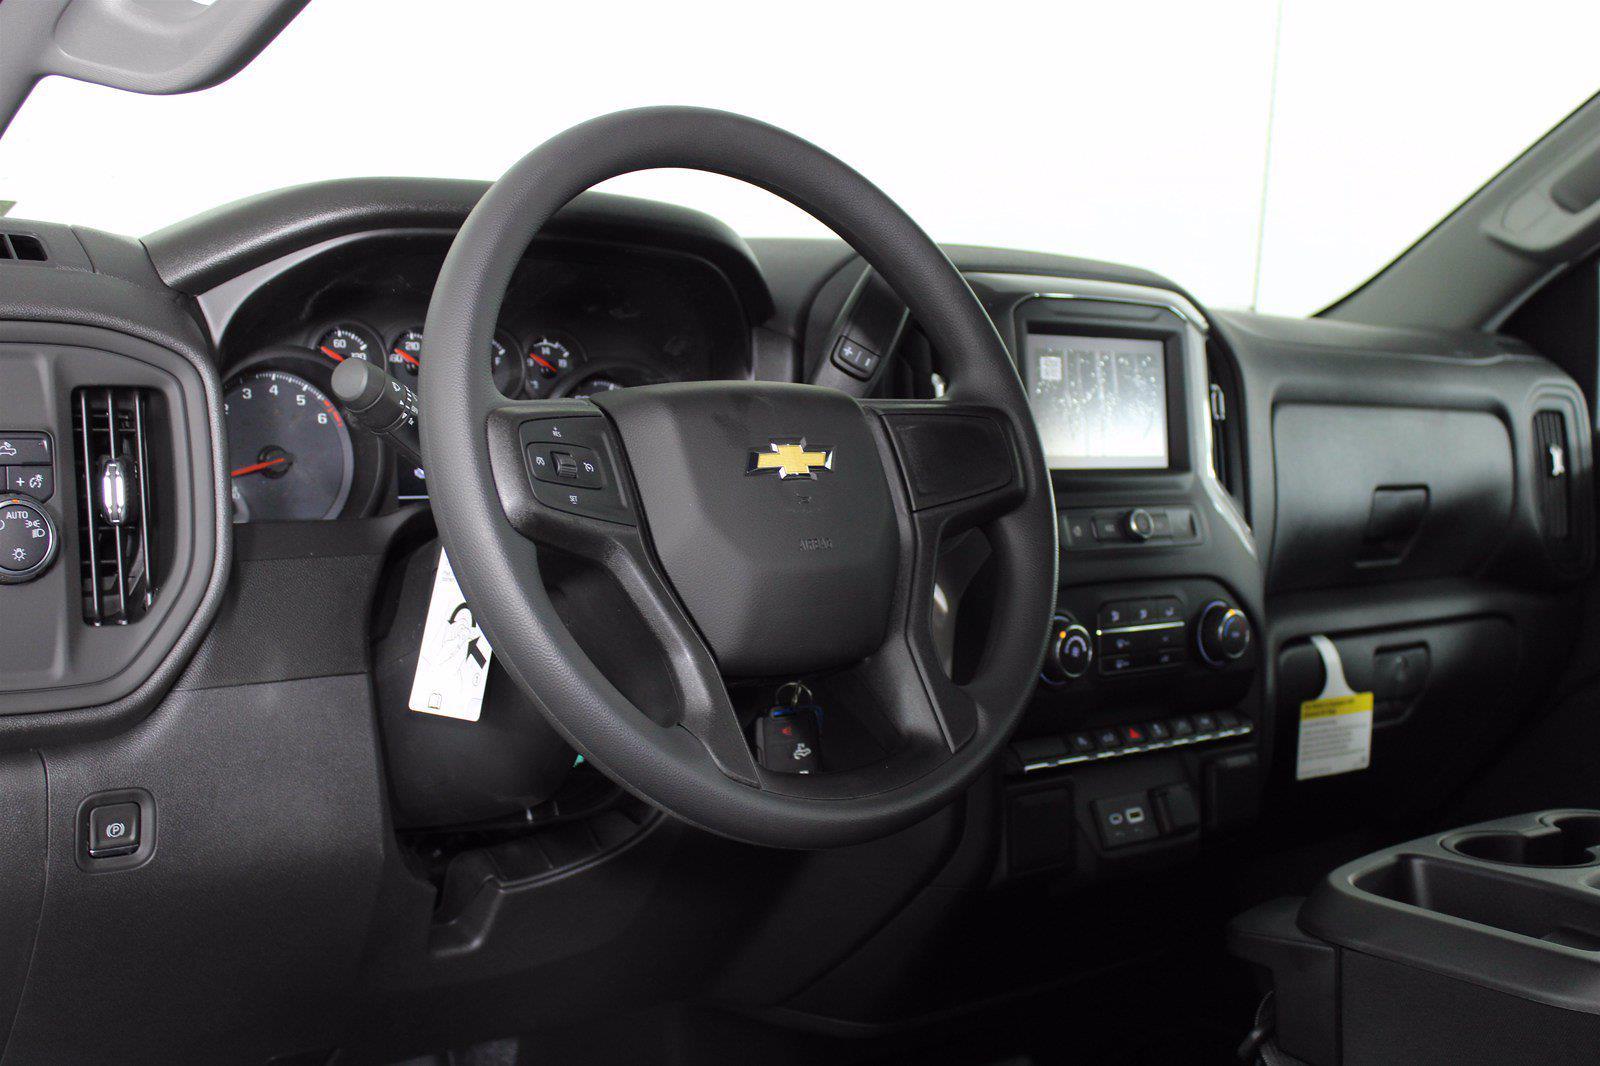 2021 Chevrolet Silverado 1500 Regular Cab 4x2, Pickup #D110764 - photo 10